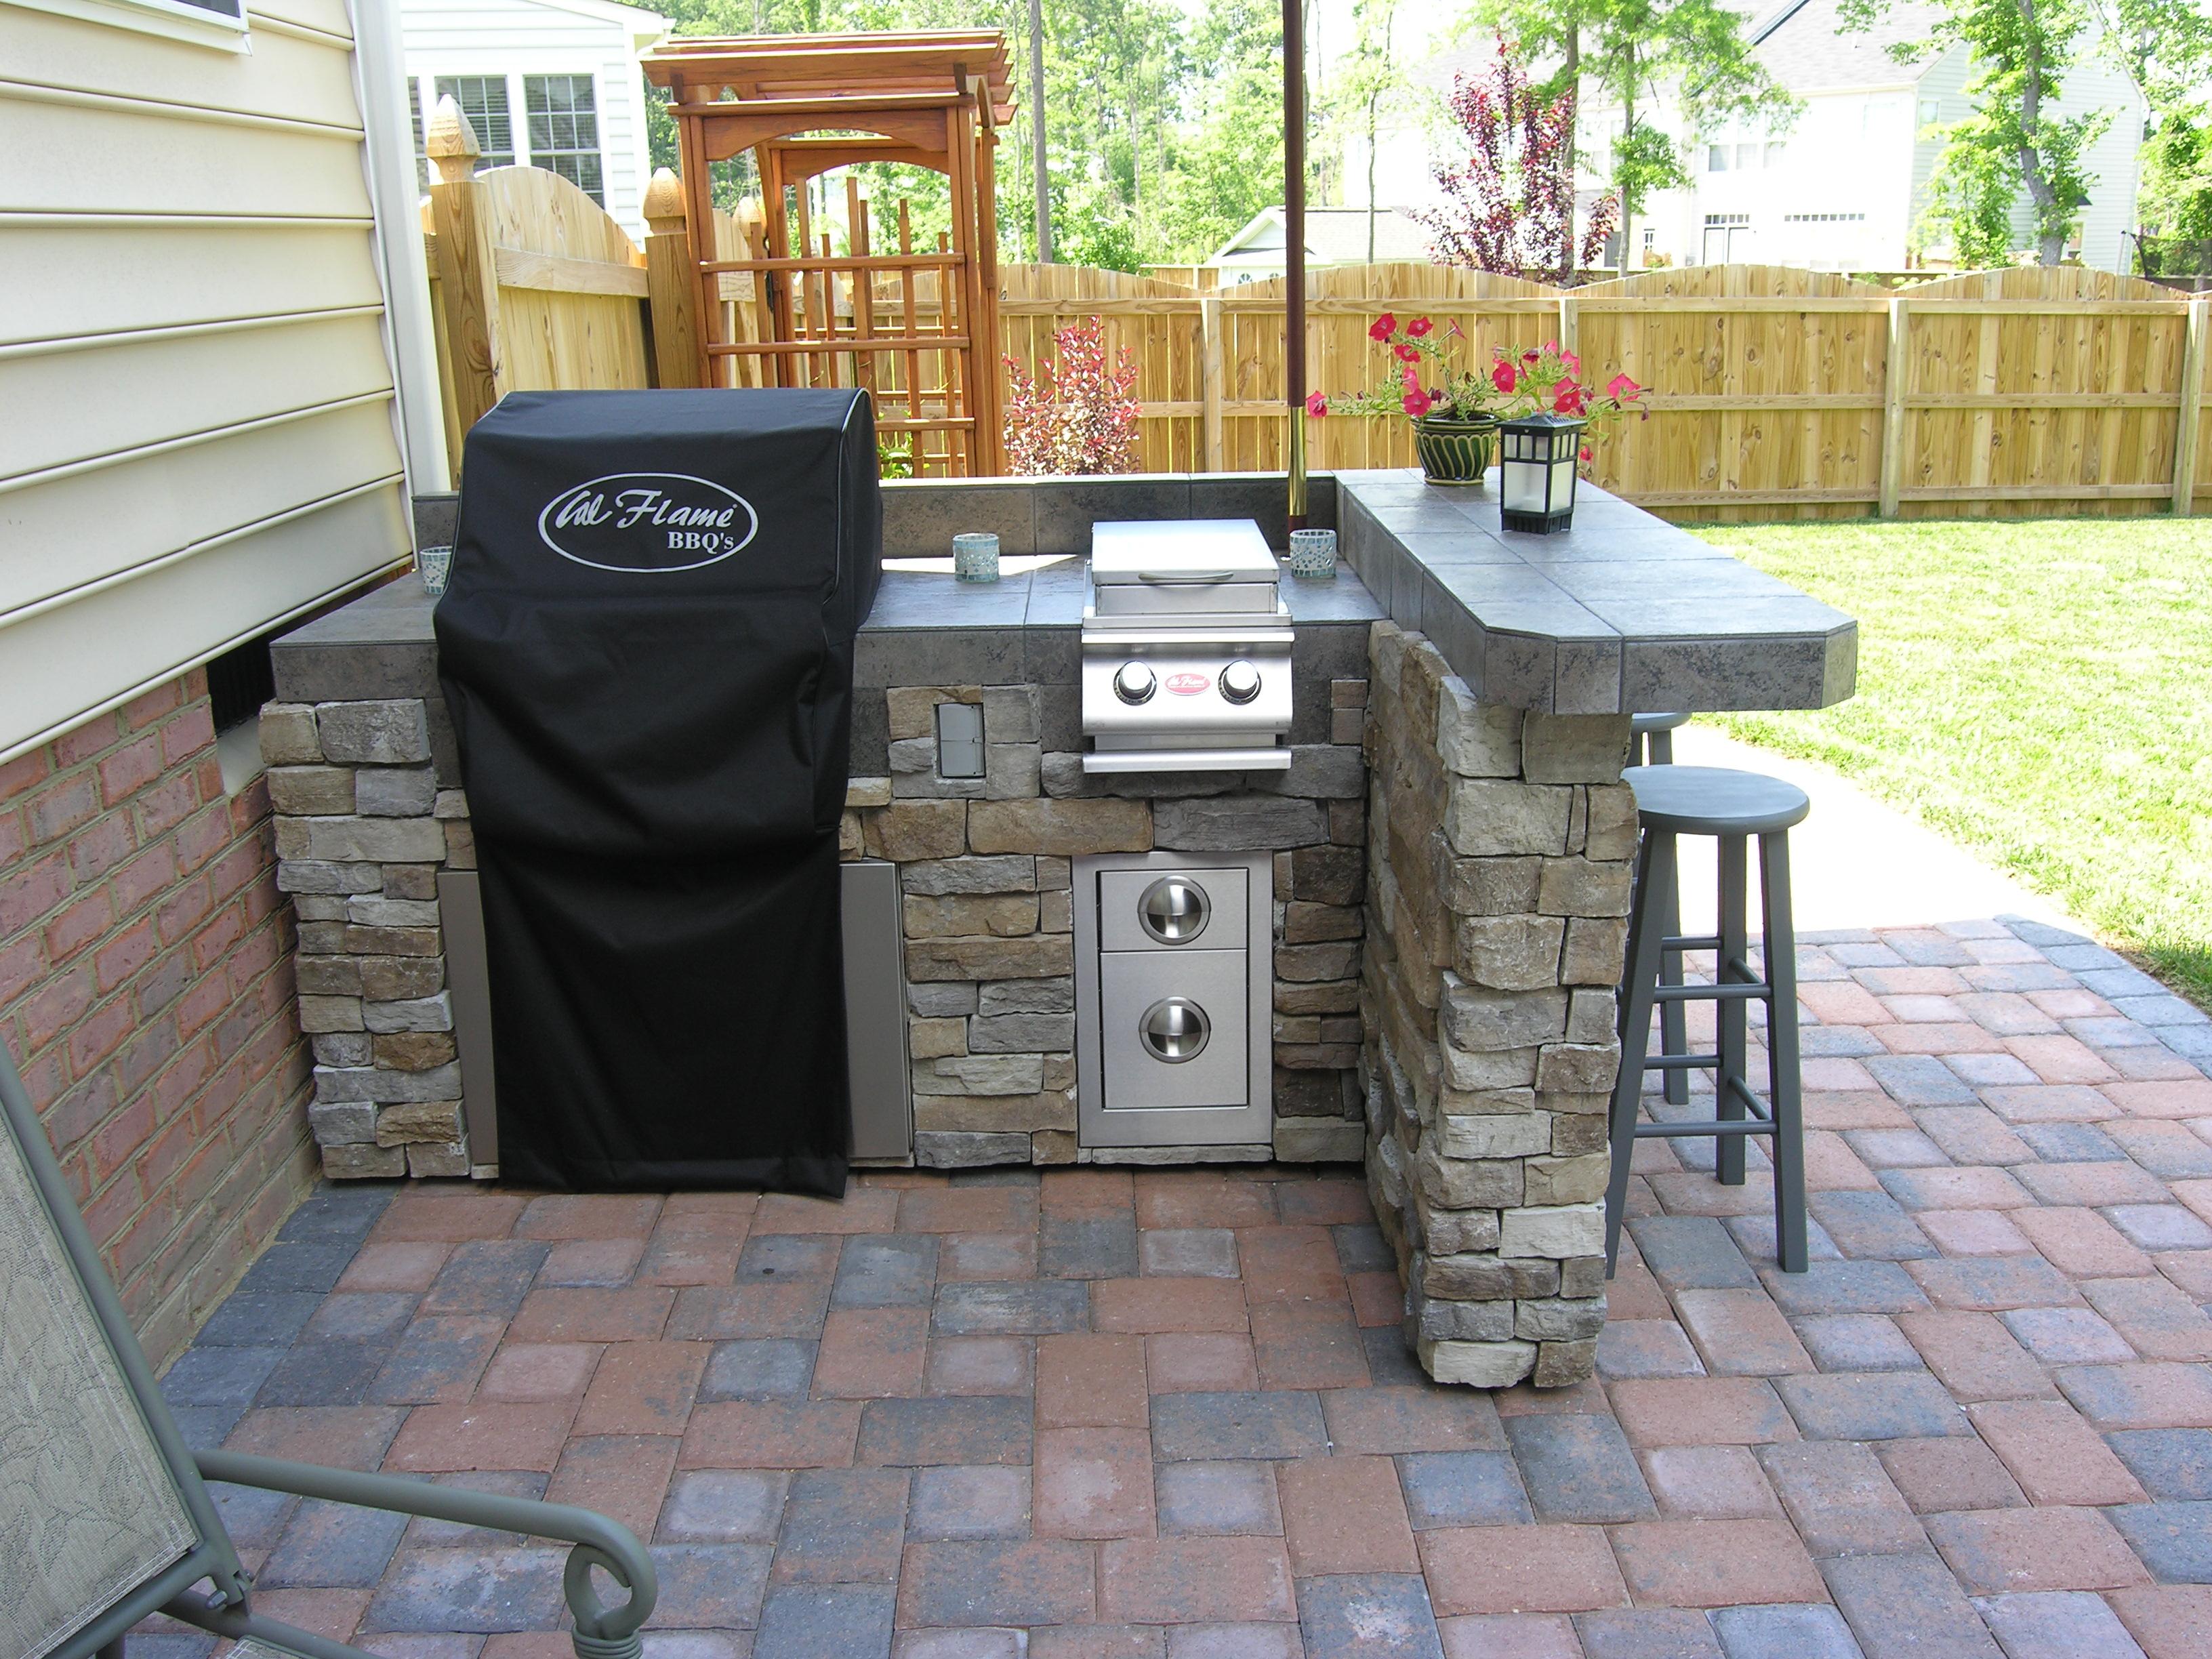 outdoor bbq kitchen outdoor kitchen design 25 best ideas about Outdoor Bbq Kitchen on Pinterest Outdoor grill area Outdoor kitchens and Backyard kitchen